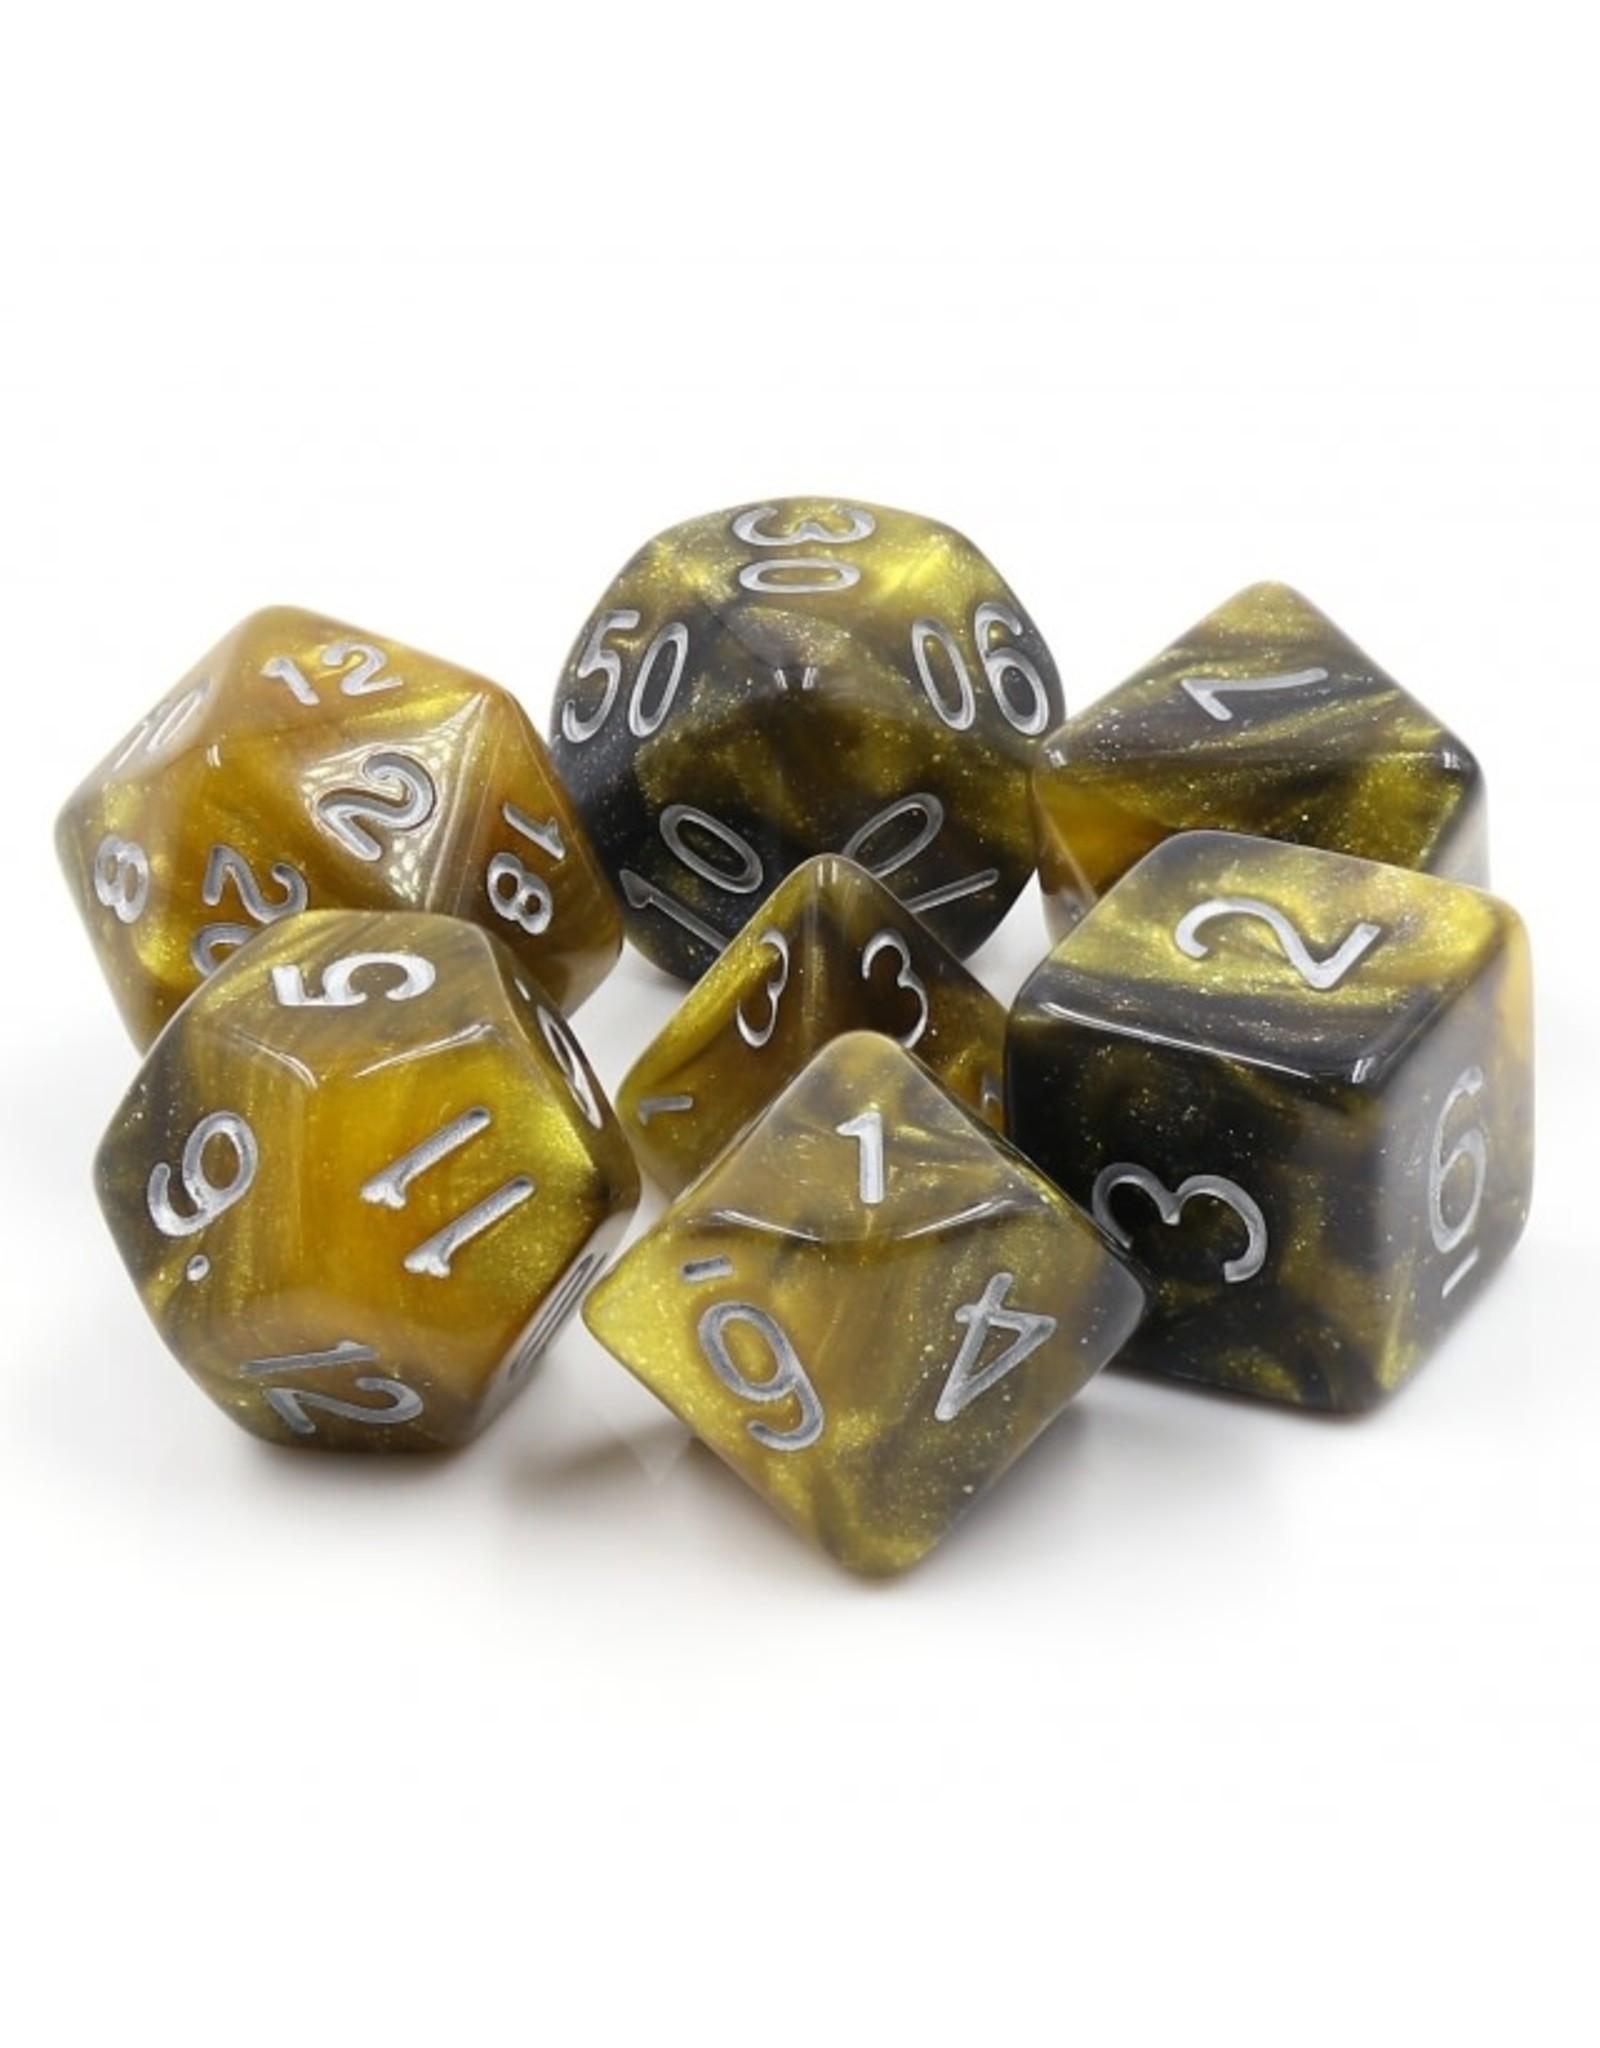 HengDa Dice 7PC RPG DICE - MONARCH